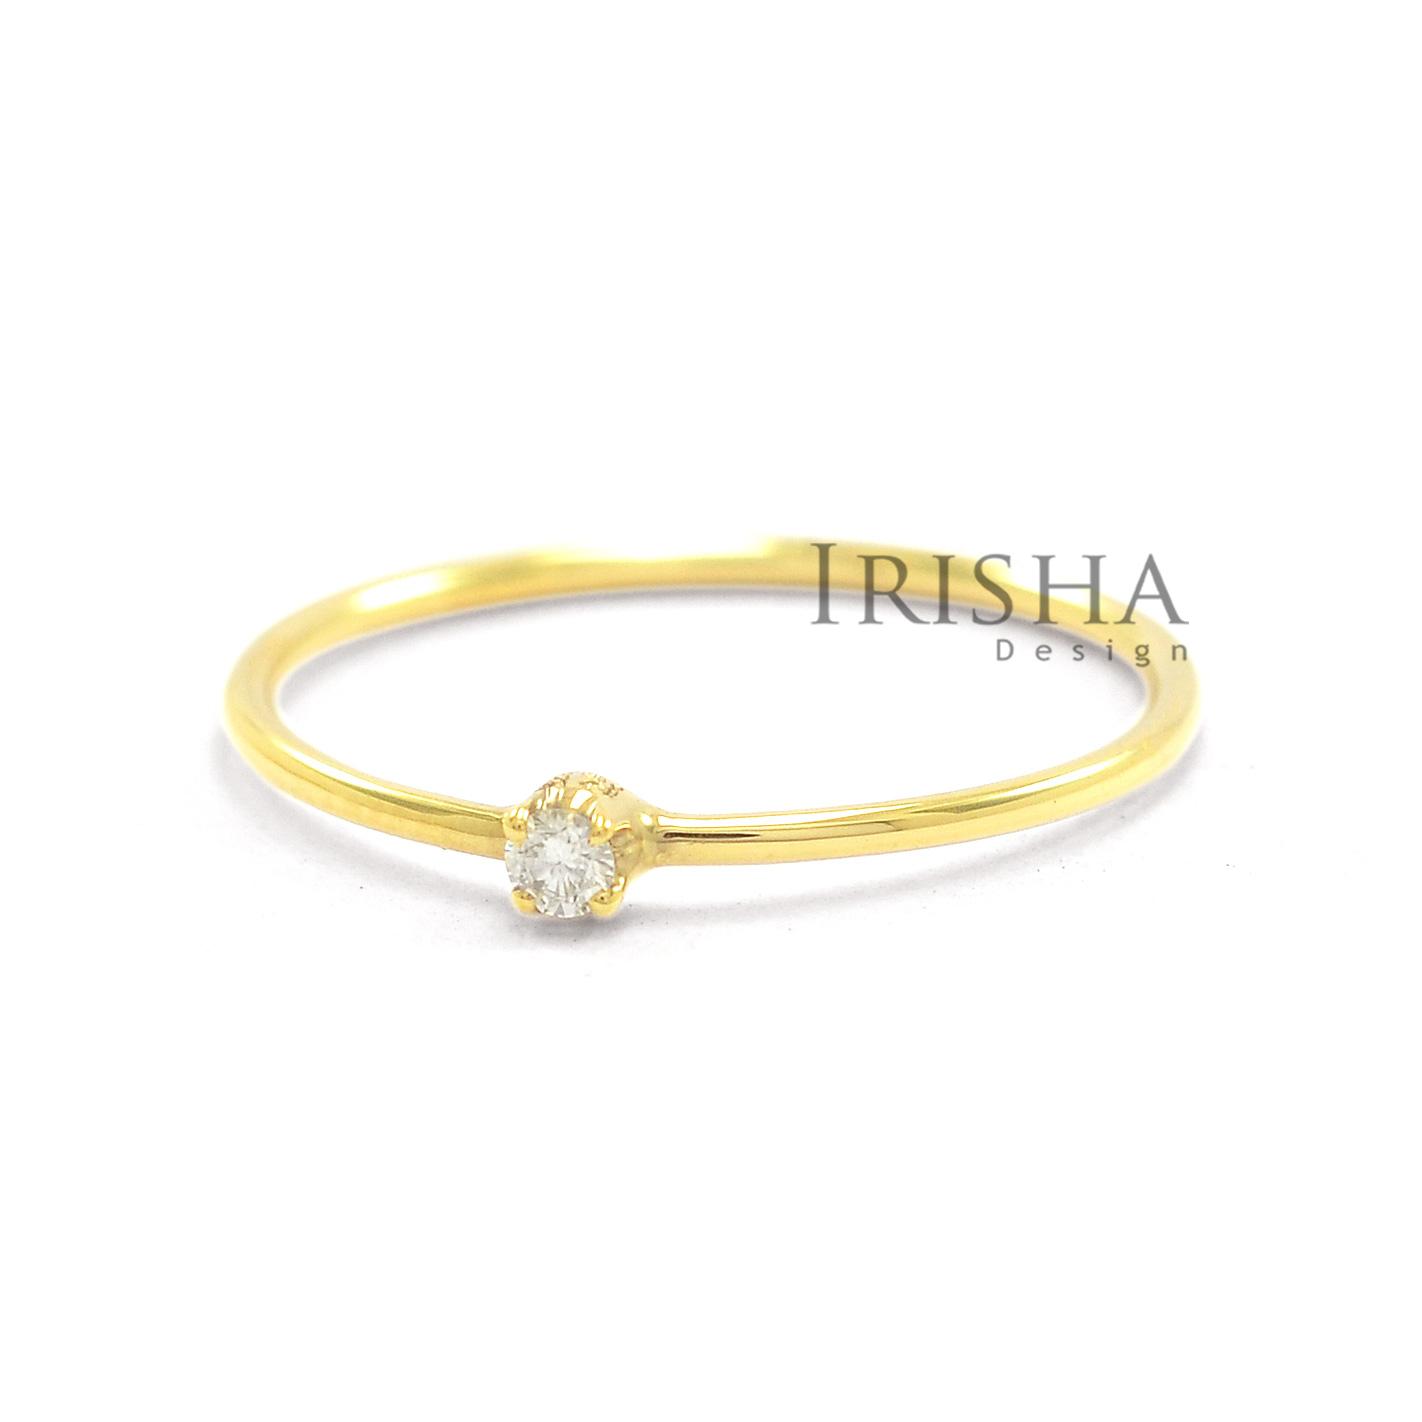 14K Gold 0.06 Ct. Solitaire Genuine Round Diamond Engagement Ring Fine Jewelry